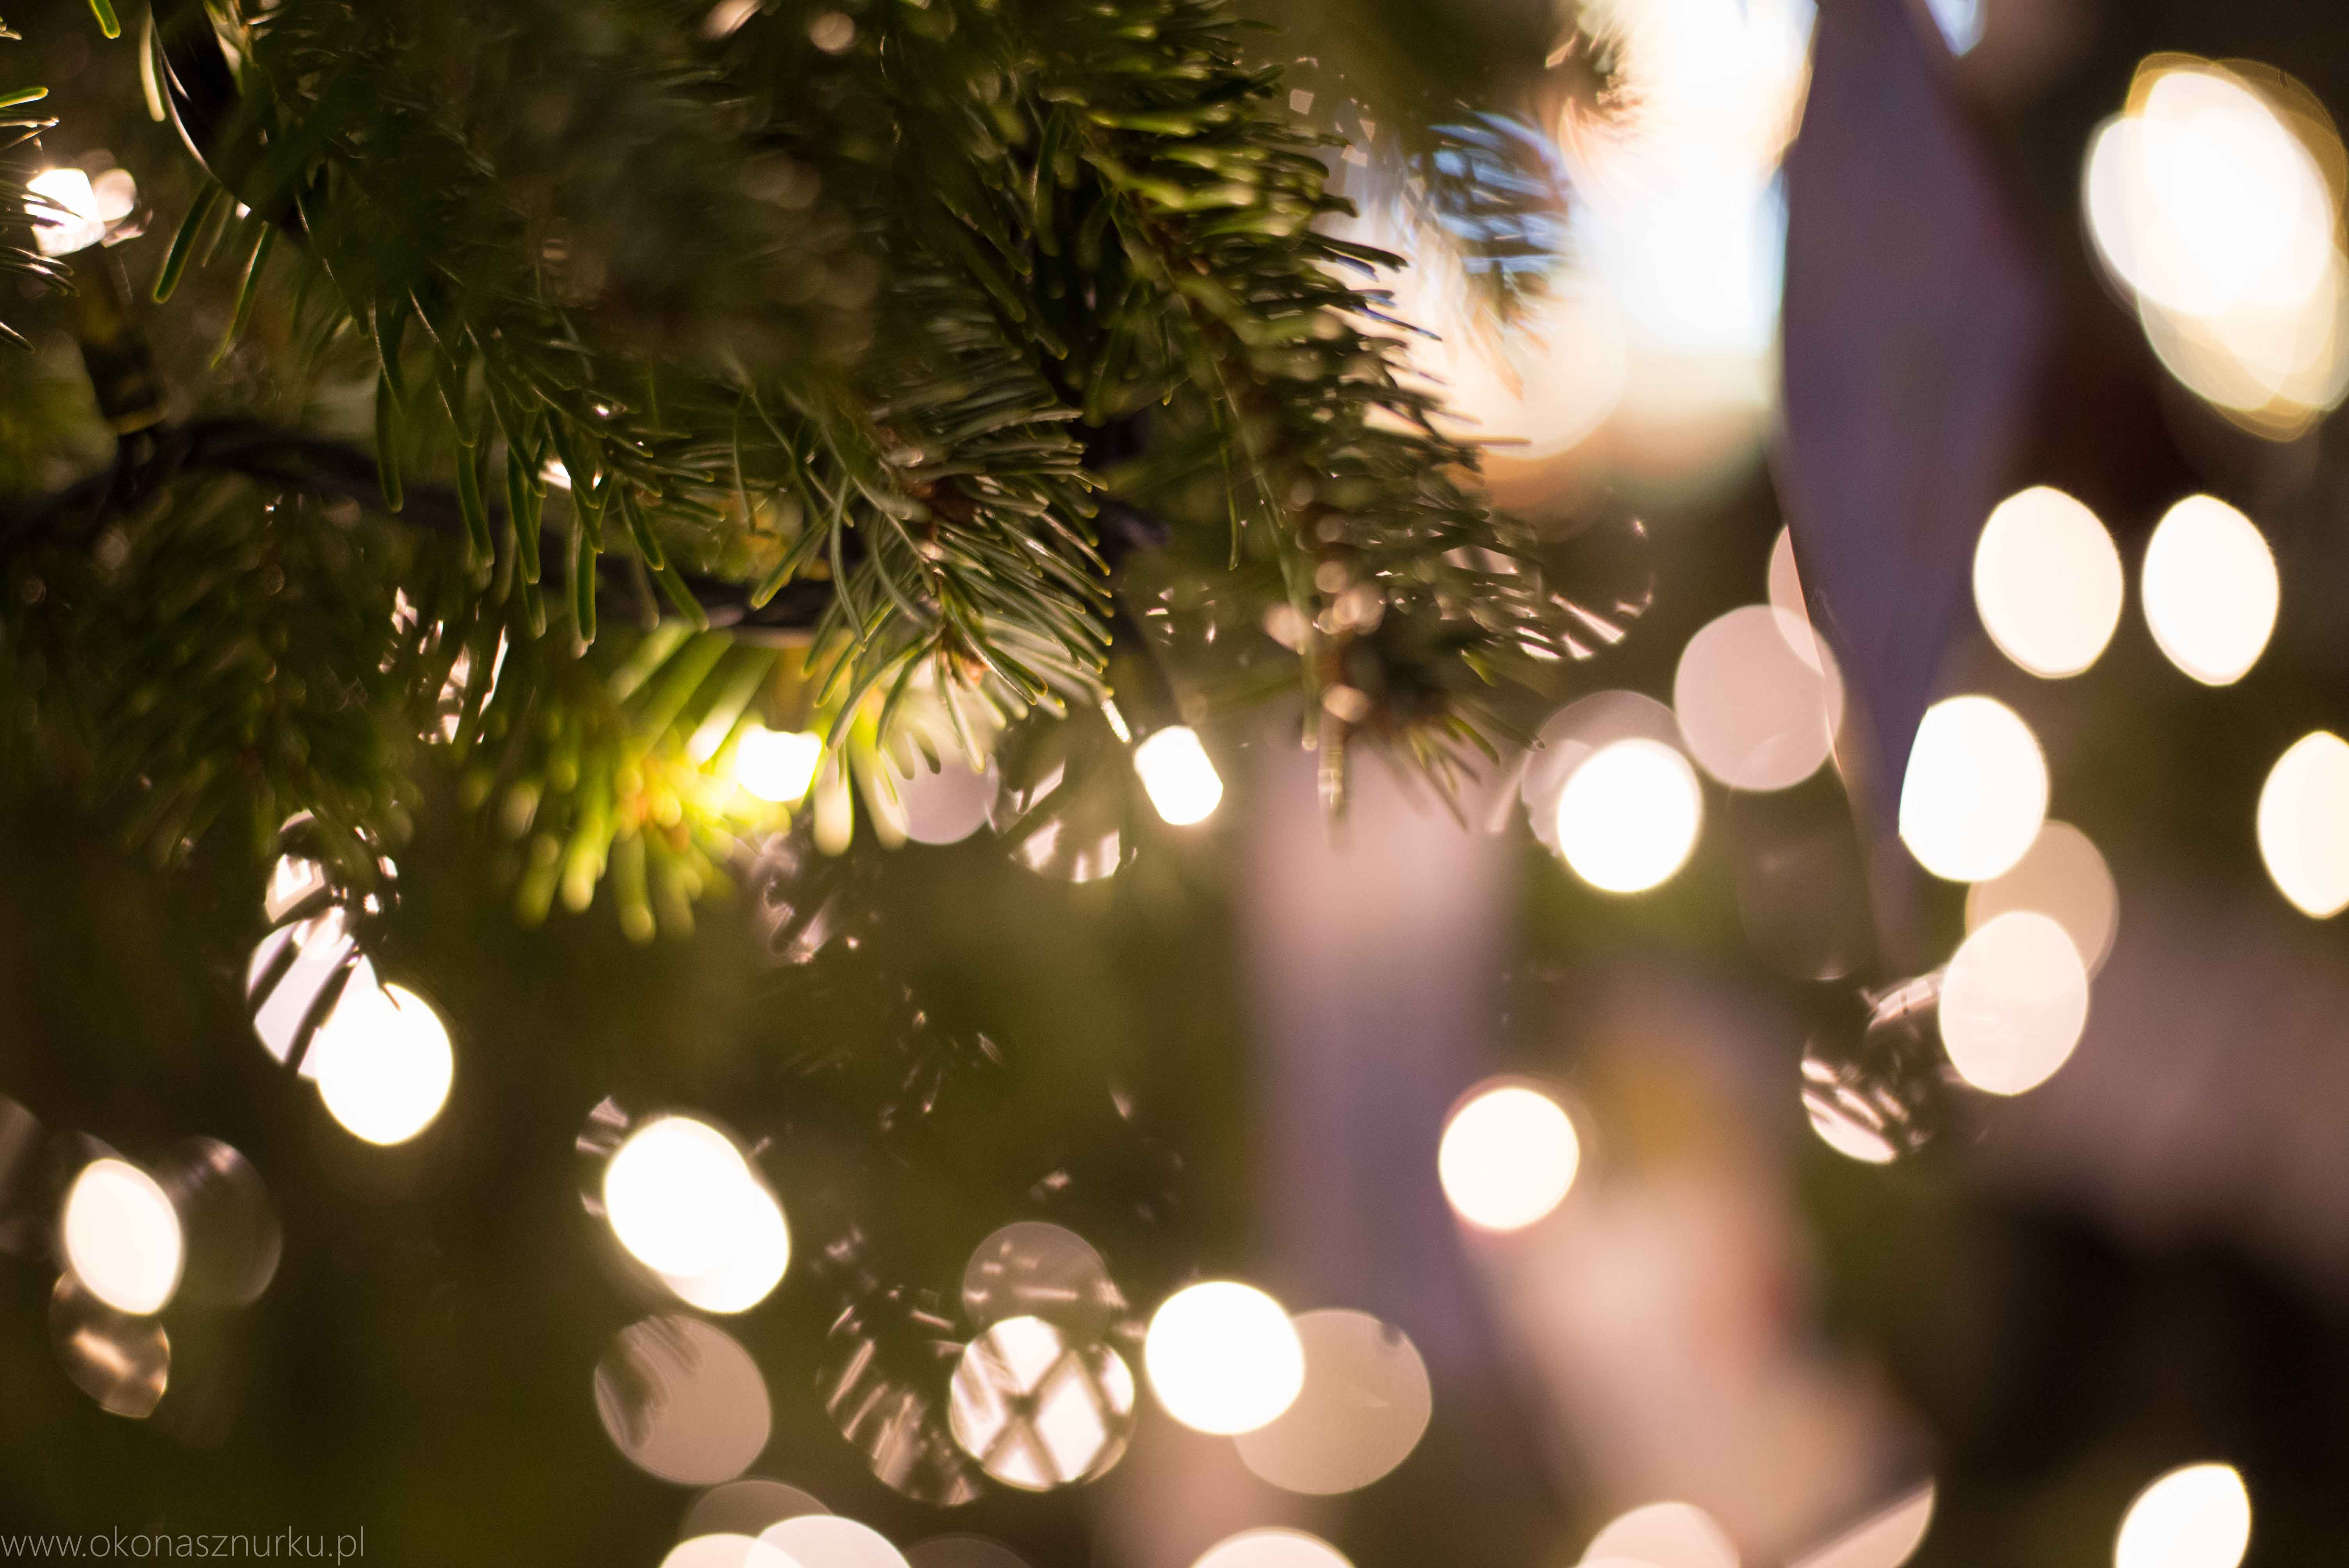 norymberga-weihnachtsmarkt-christmas-market-nurnberg (16)